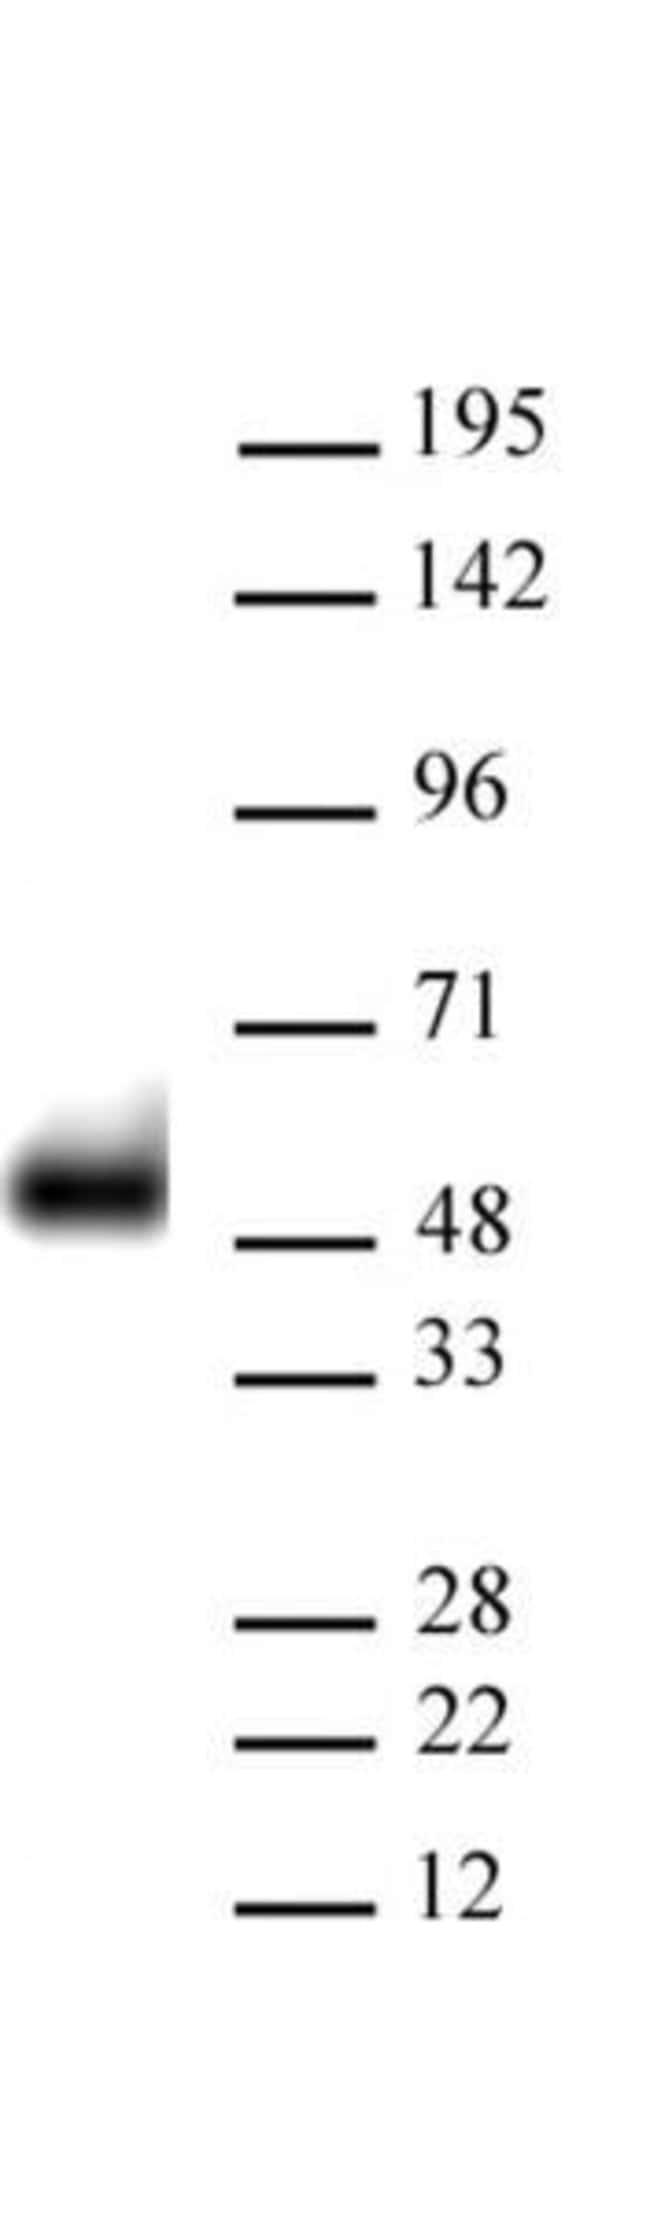 p53 Mouse anti-Human, Active Motif:Antibodies:Primary Antibodies